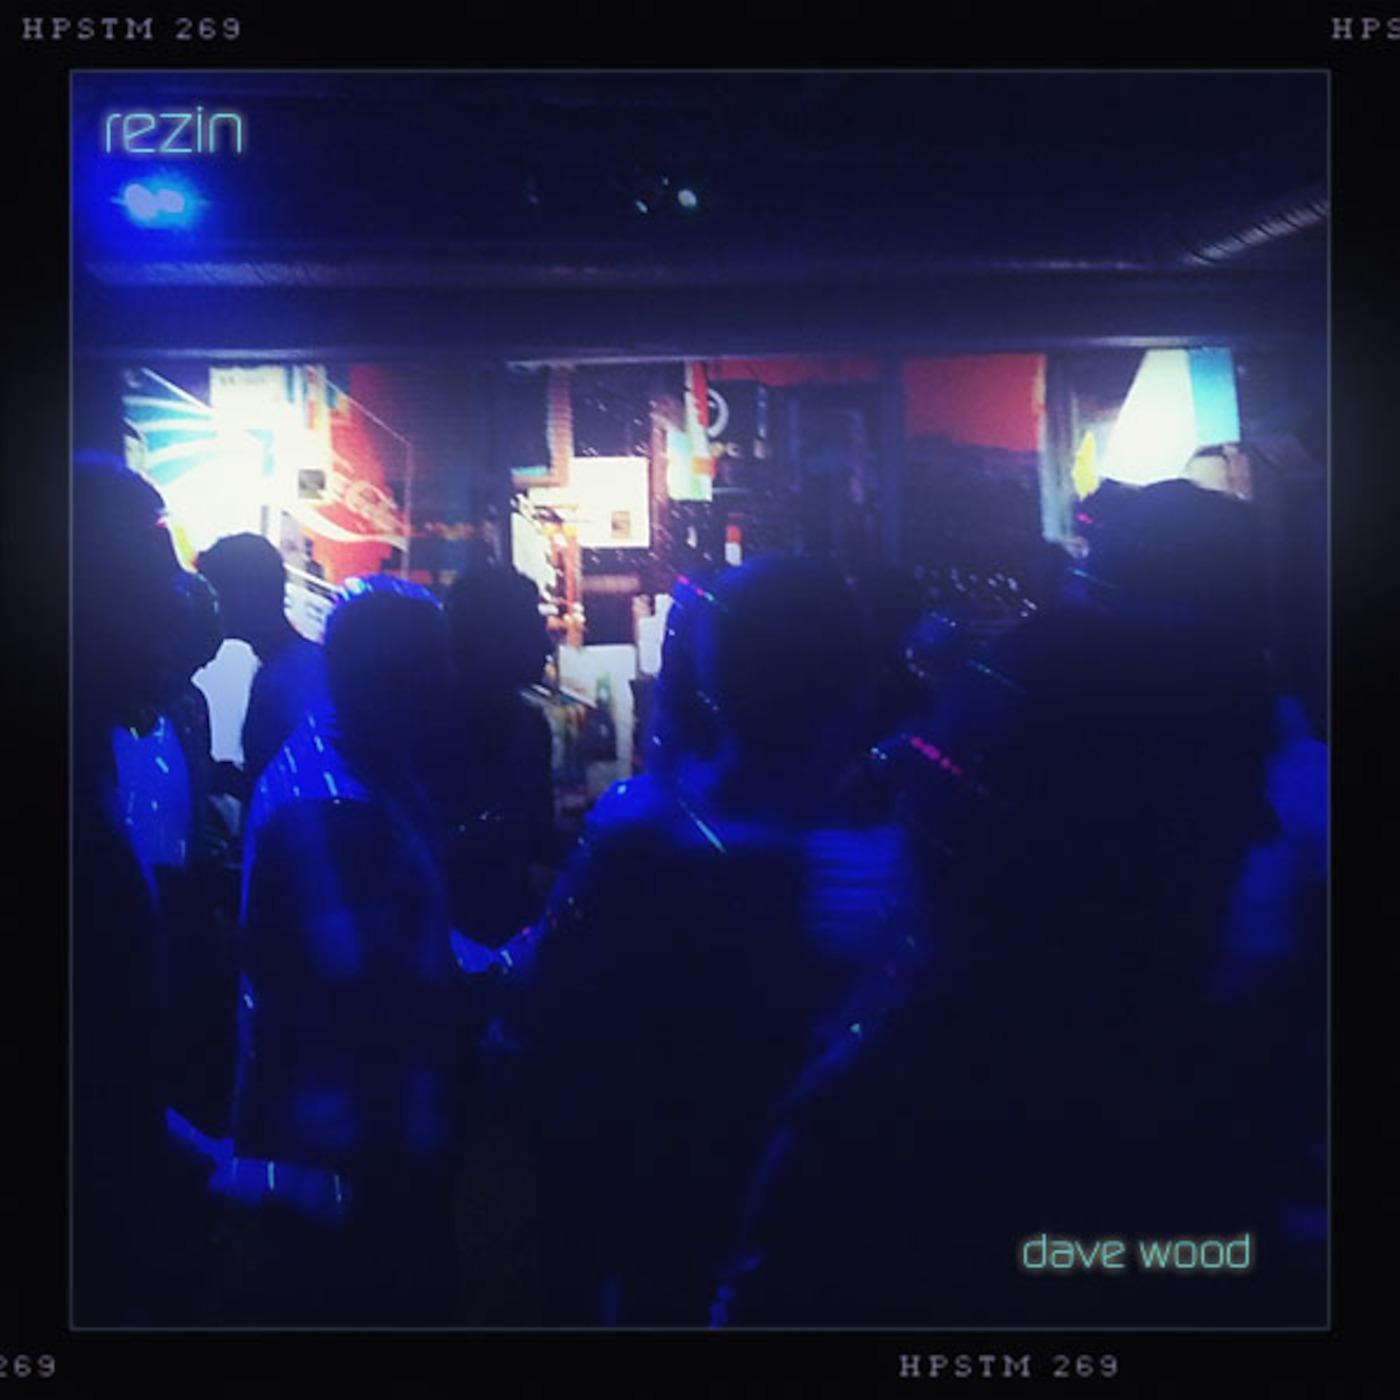 Transmission#21 - Rezin